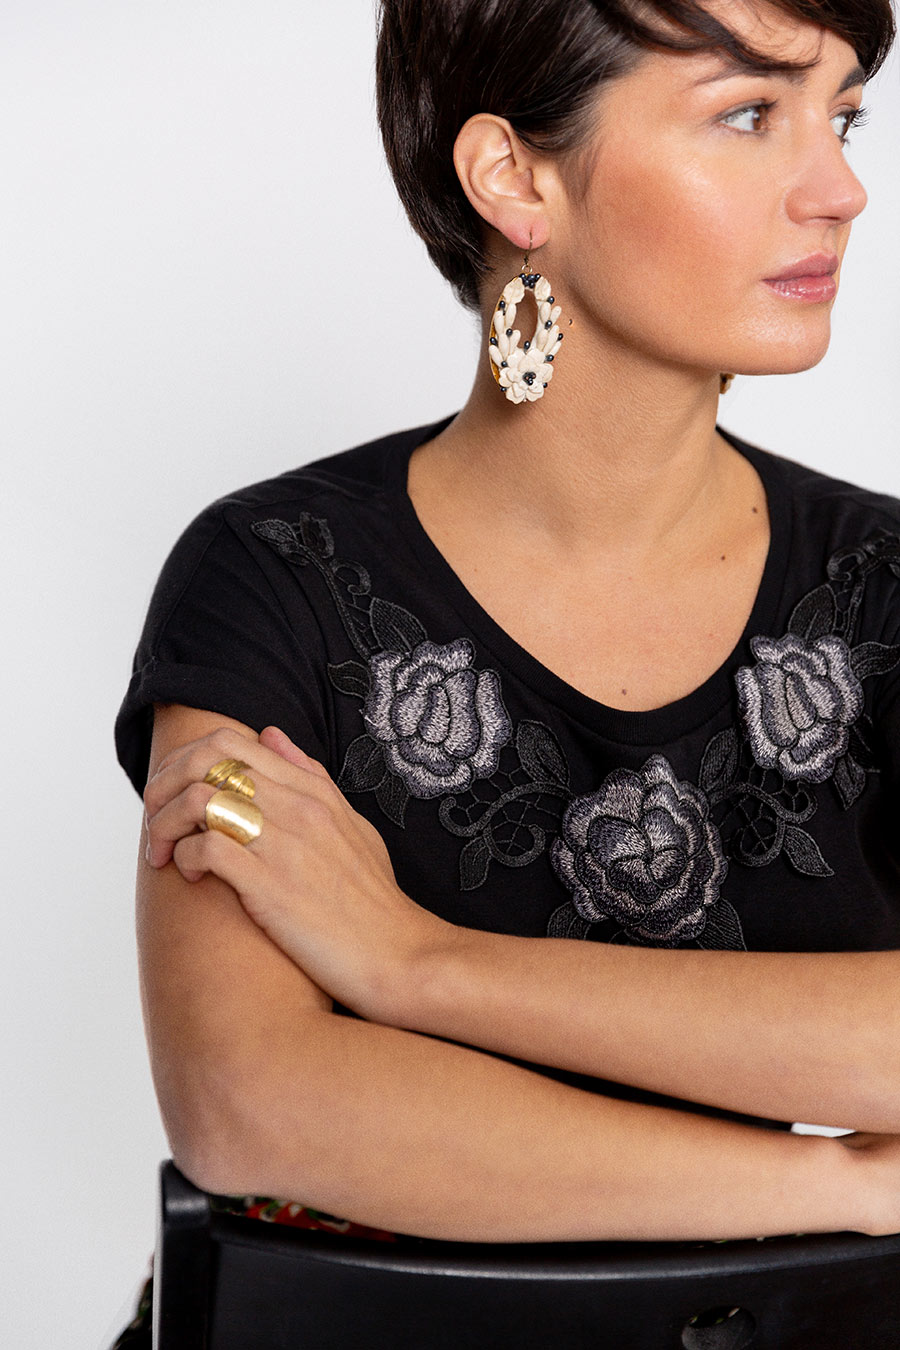 OTRORA_Camiseta manga corta en punto de algodón con aplique bordado flores negras